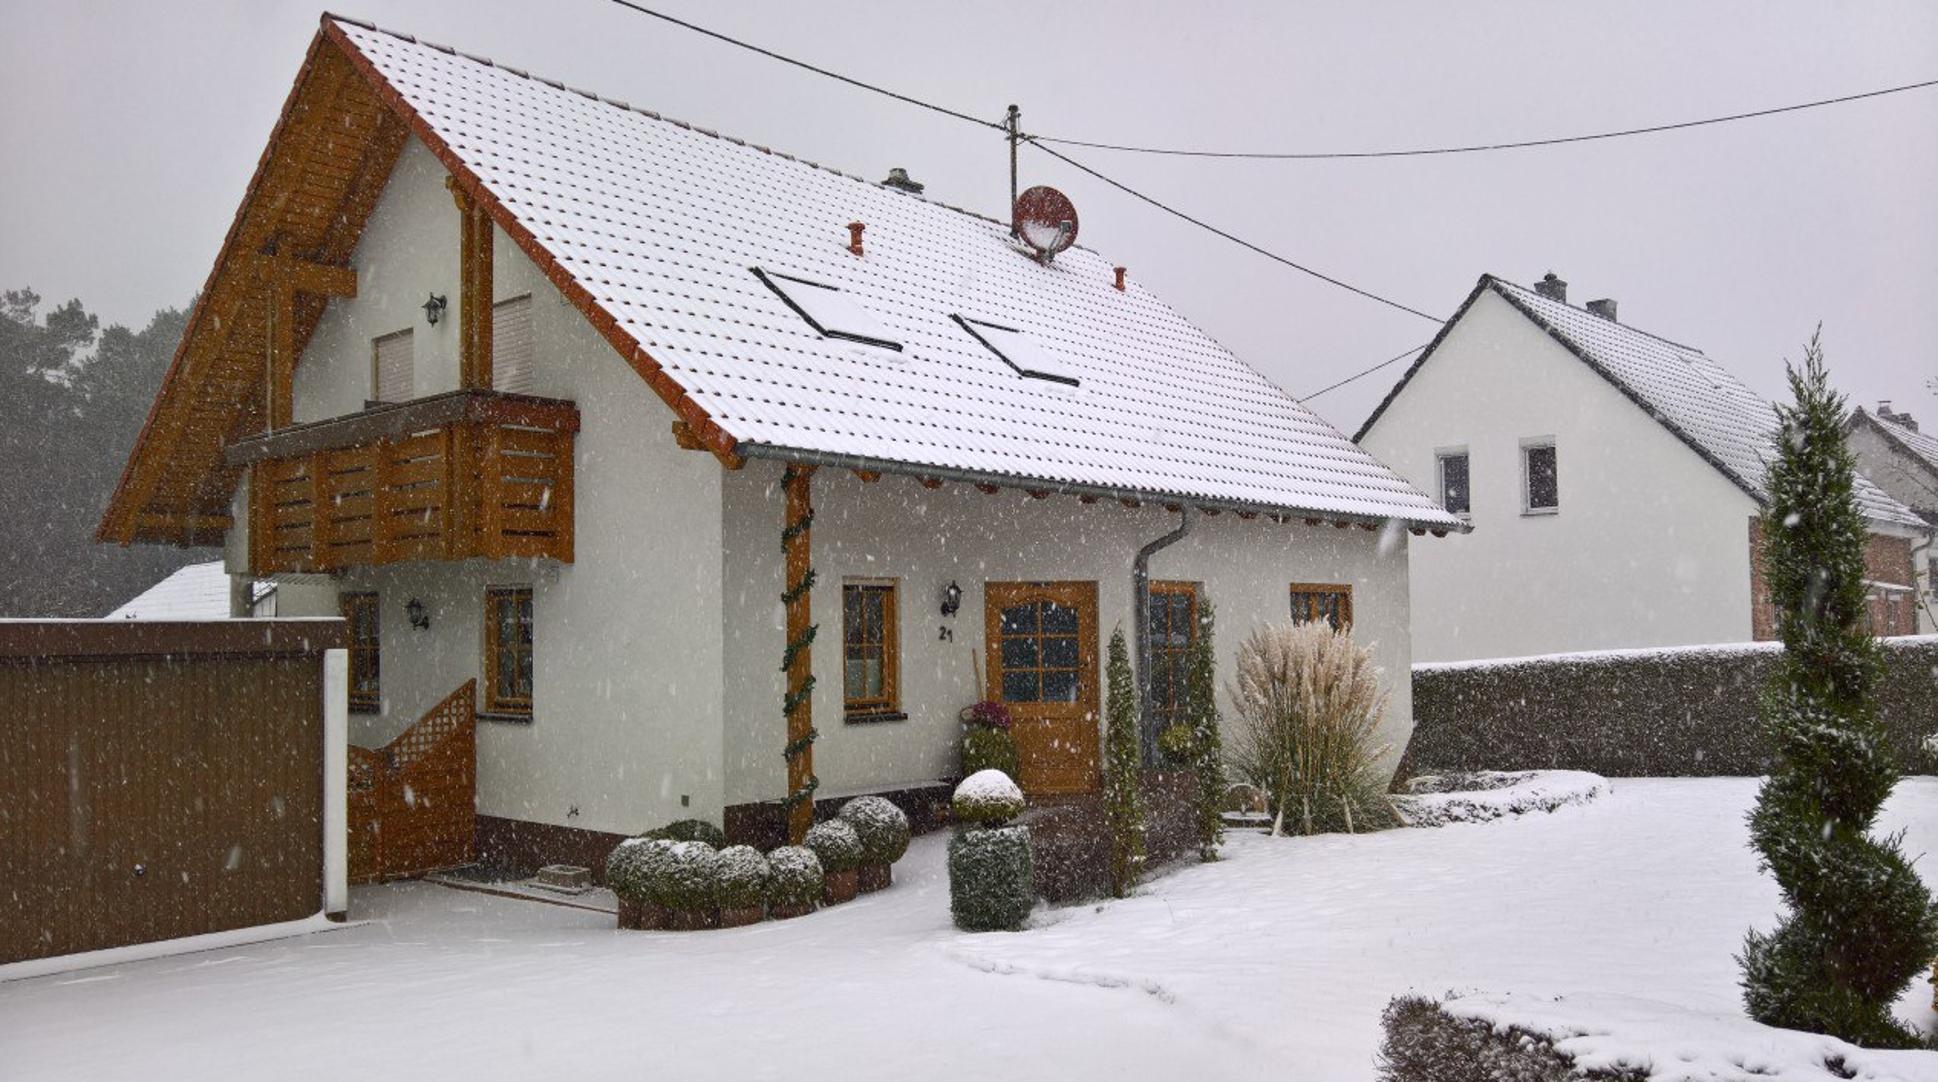 http://www.pfalzherz.de/wp-content/uploads/2018/03/Unser-Haus-im-Schnee-am-10.12.2017_2.jpeg